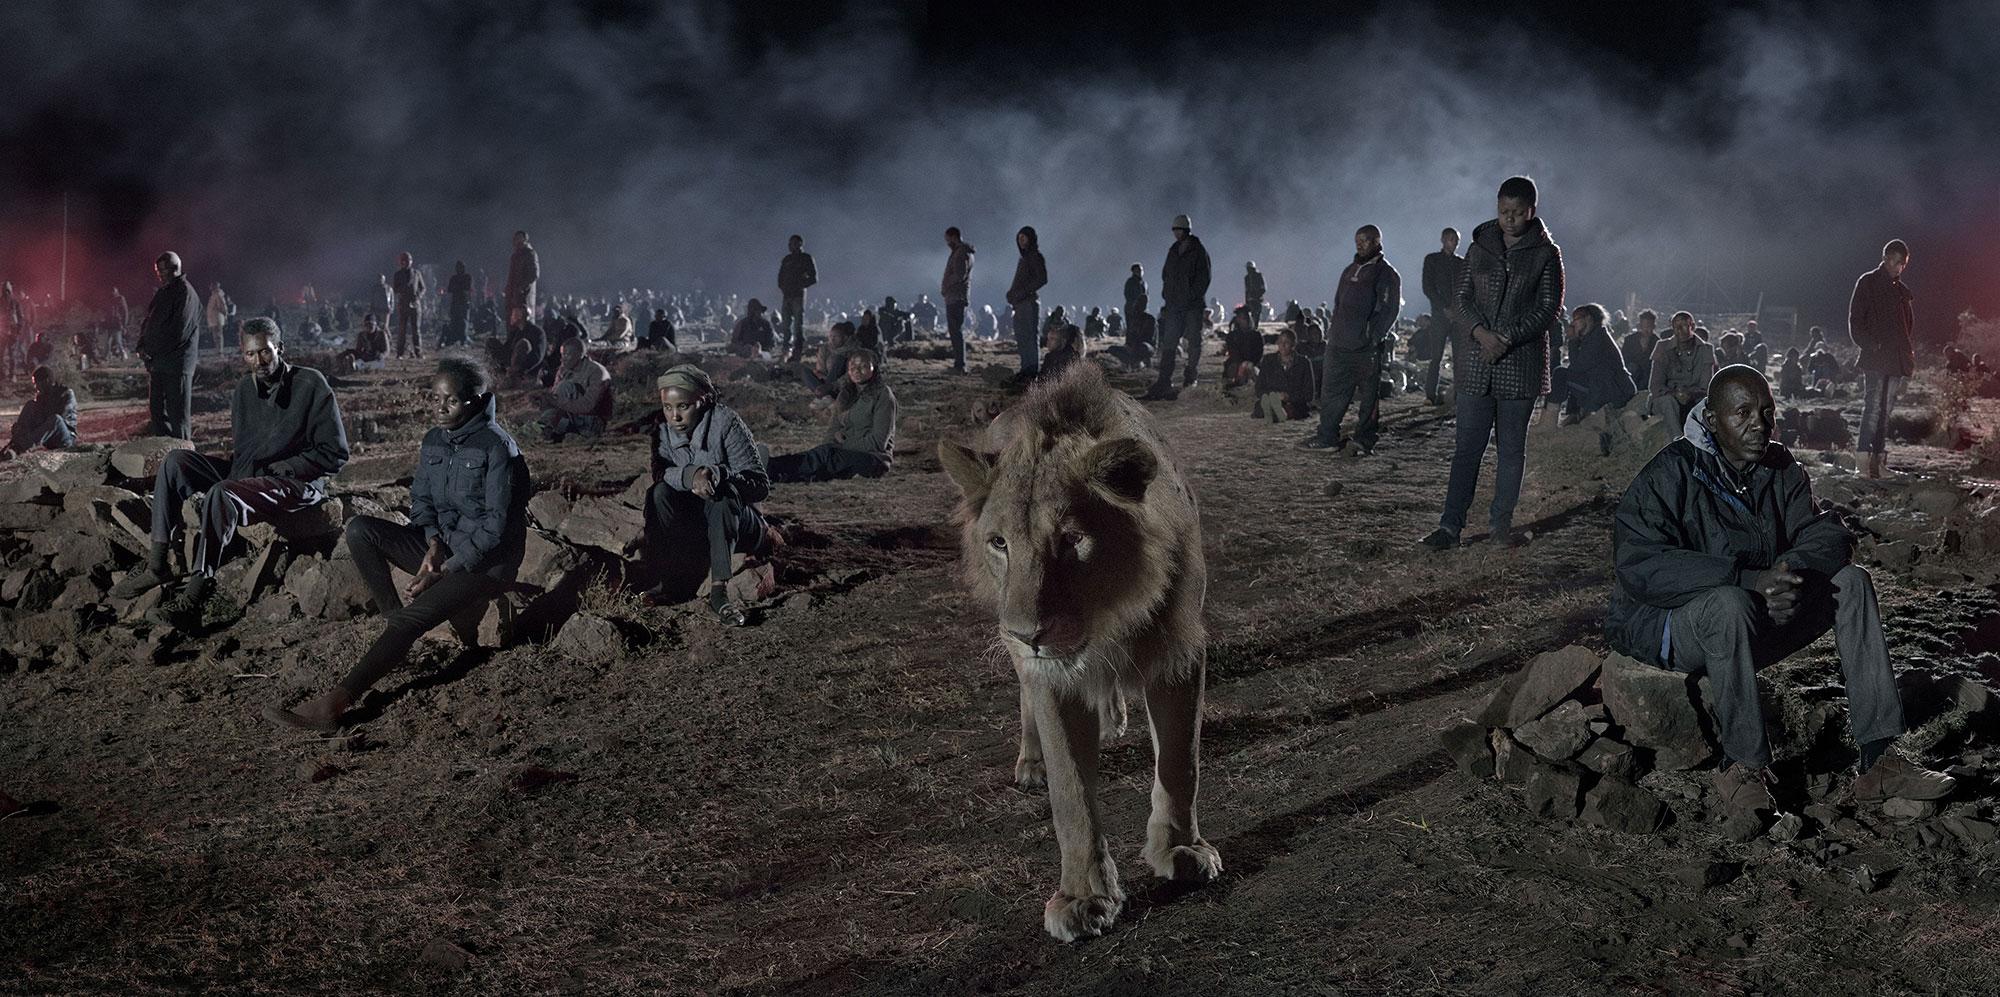 Savannah With Lion & Humans. Copyright Nick Brandt.